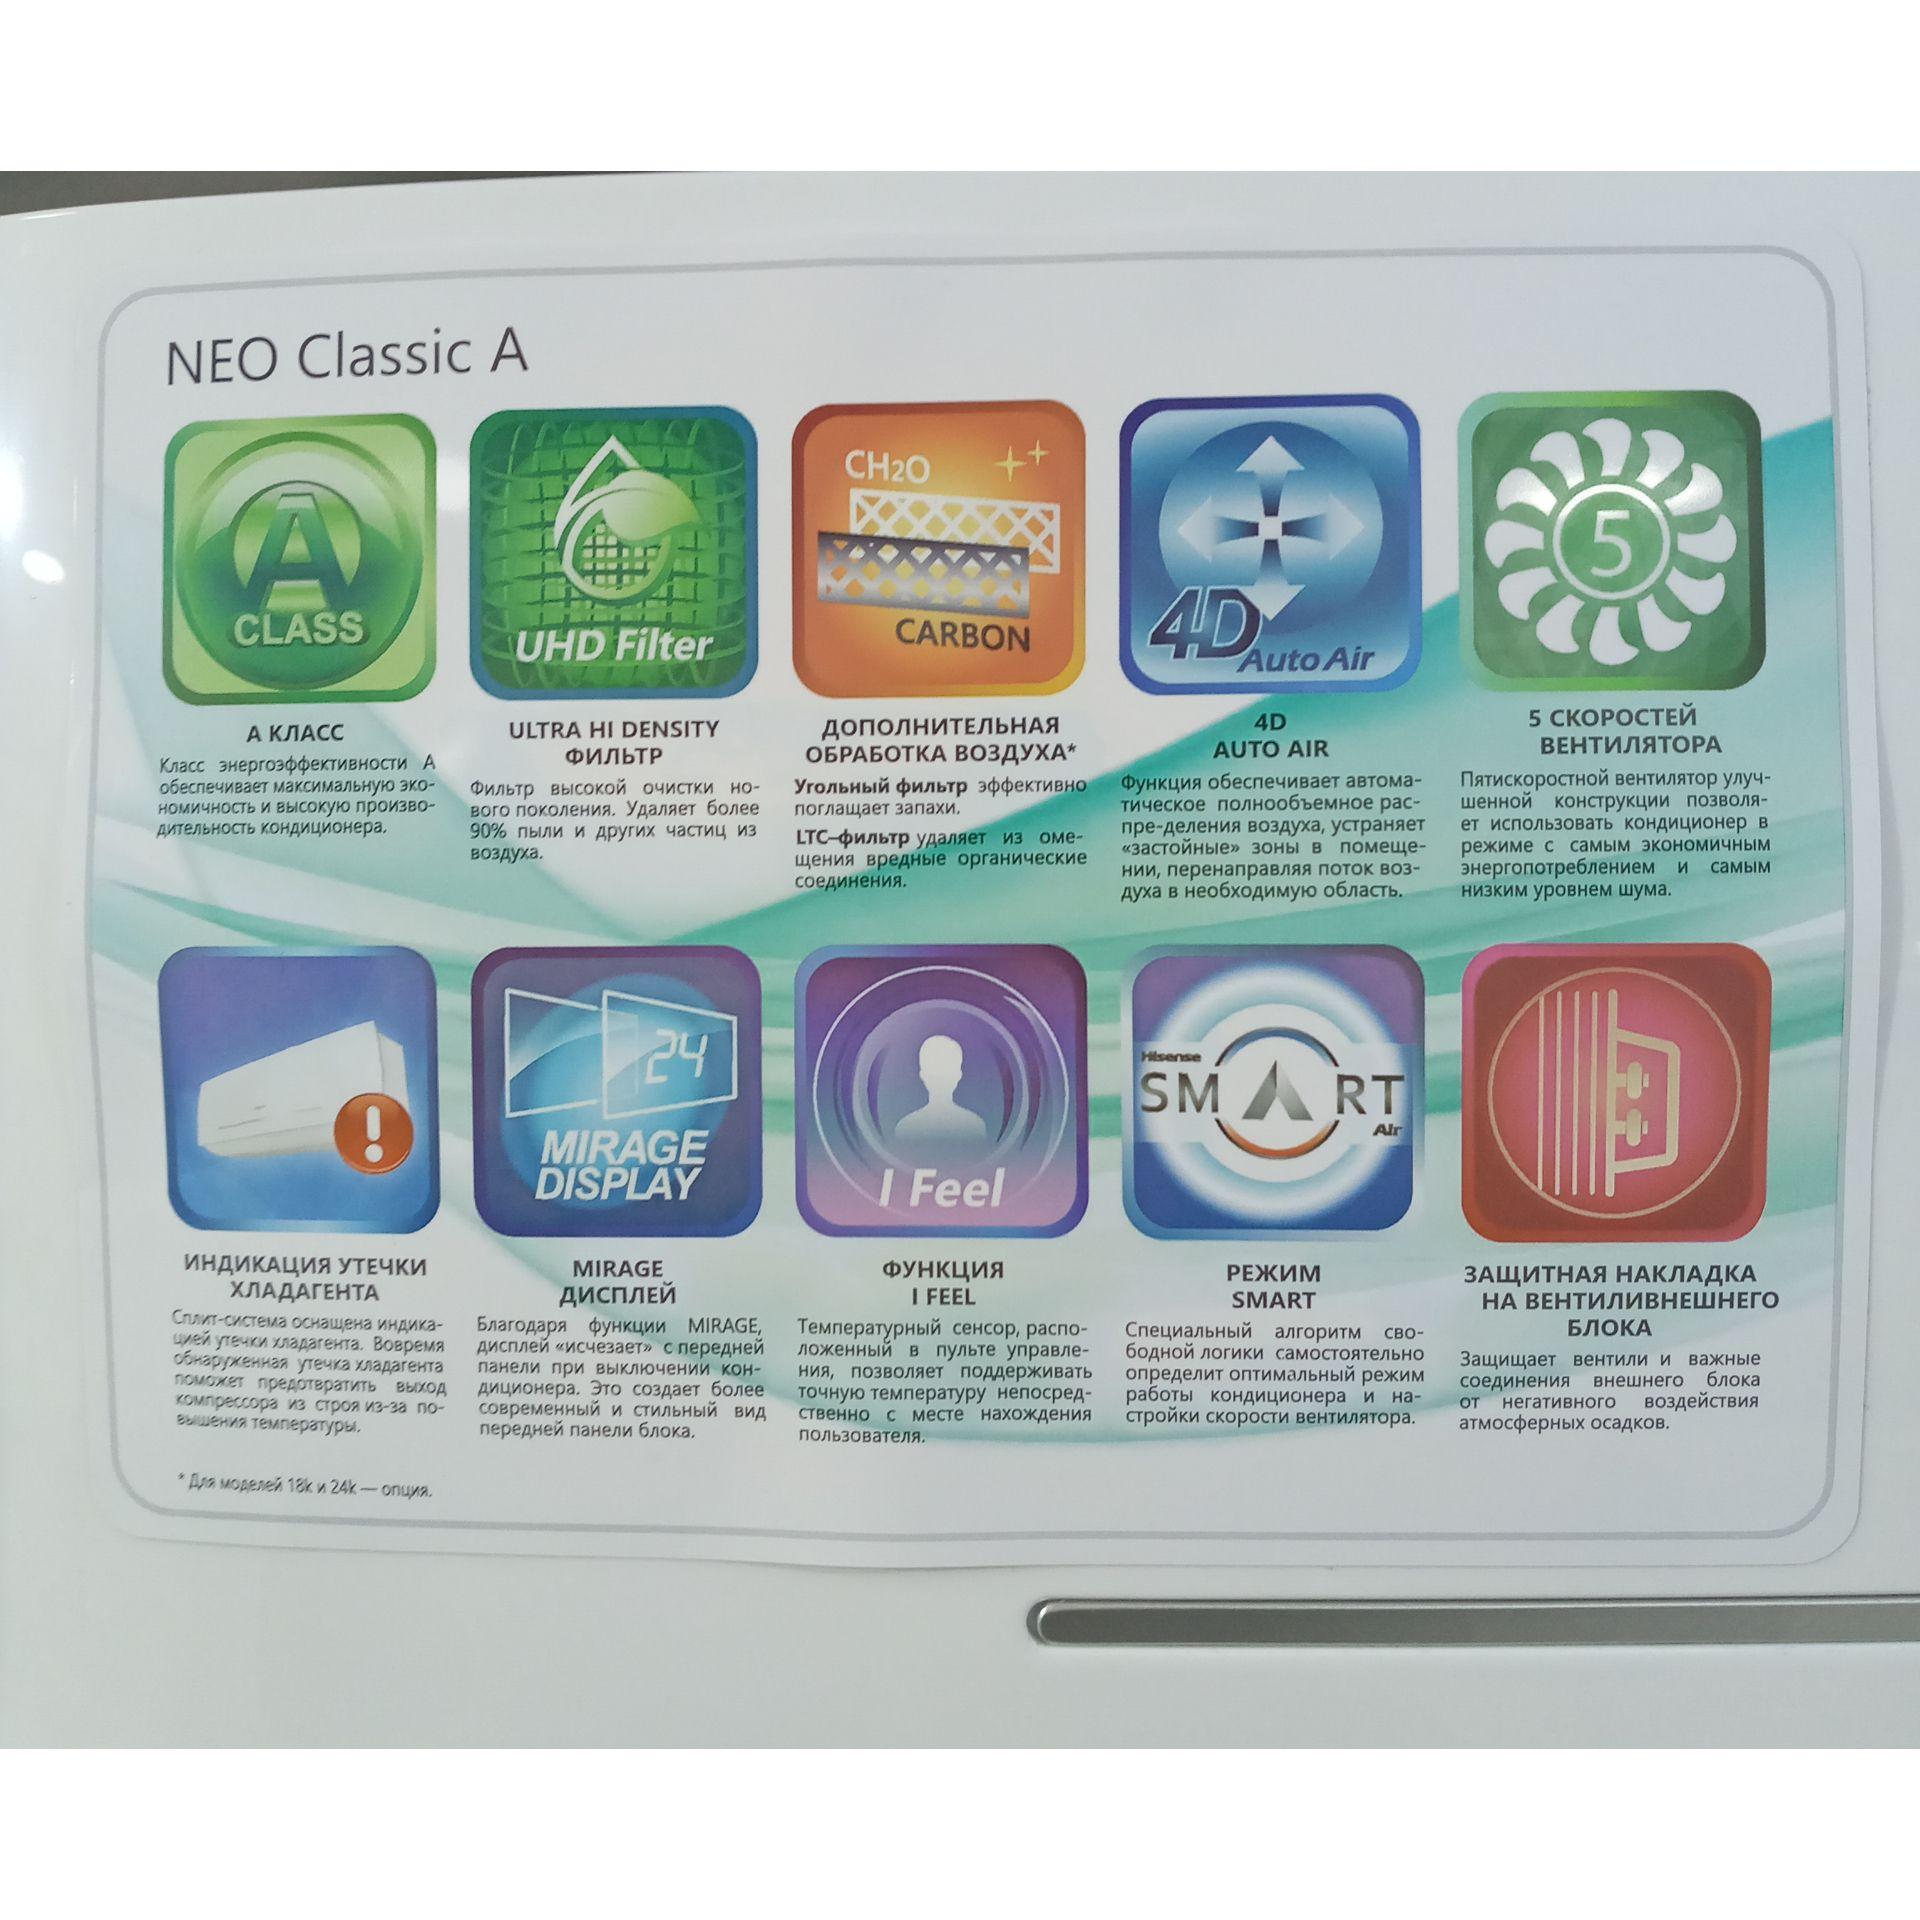 Кондиционер Hisense Neo Classic на 20 квадратов